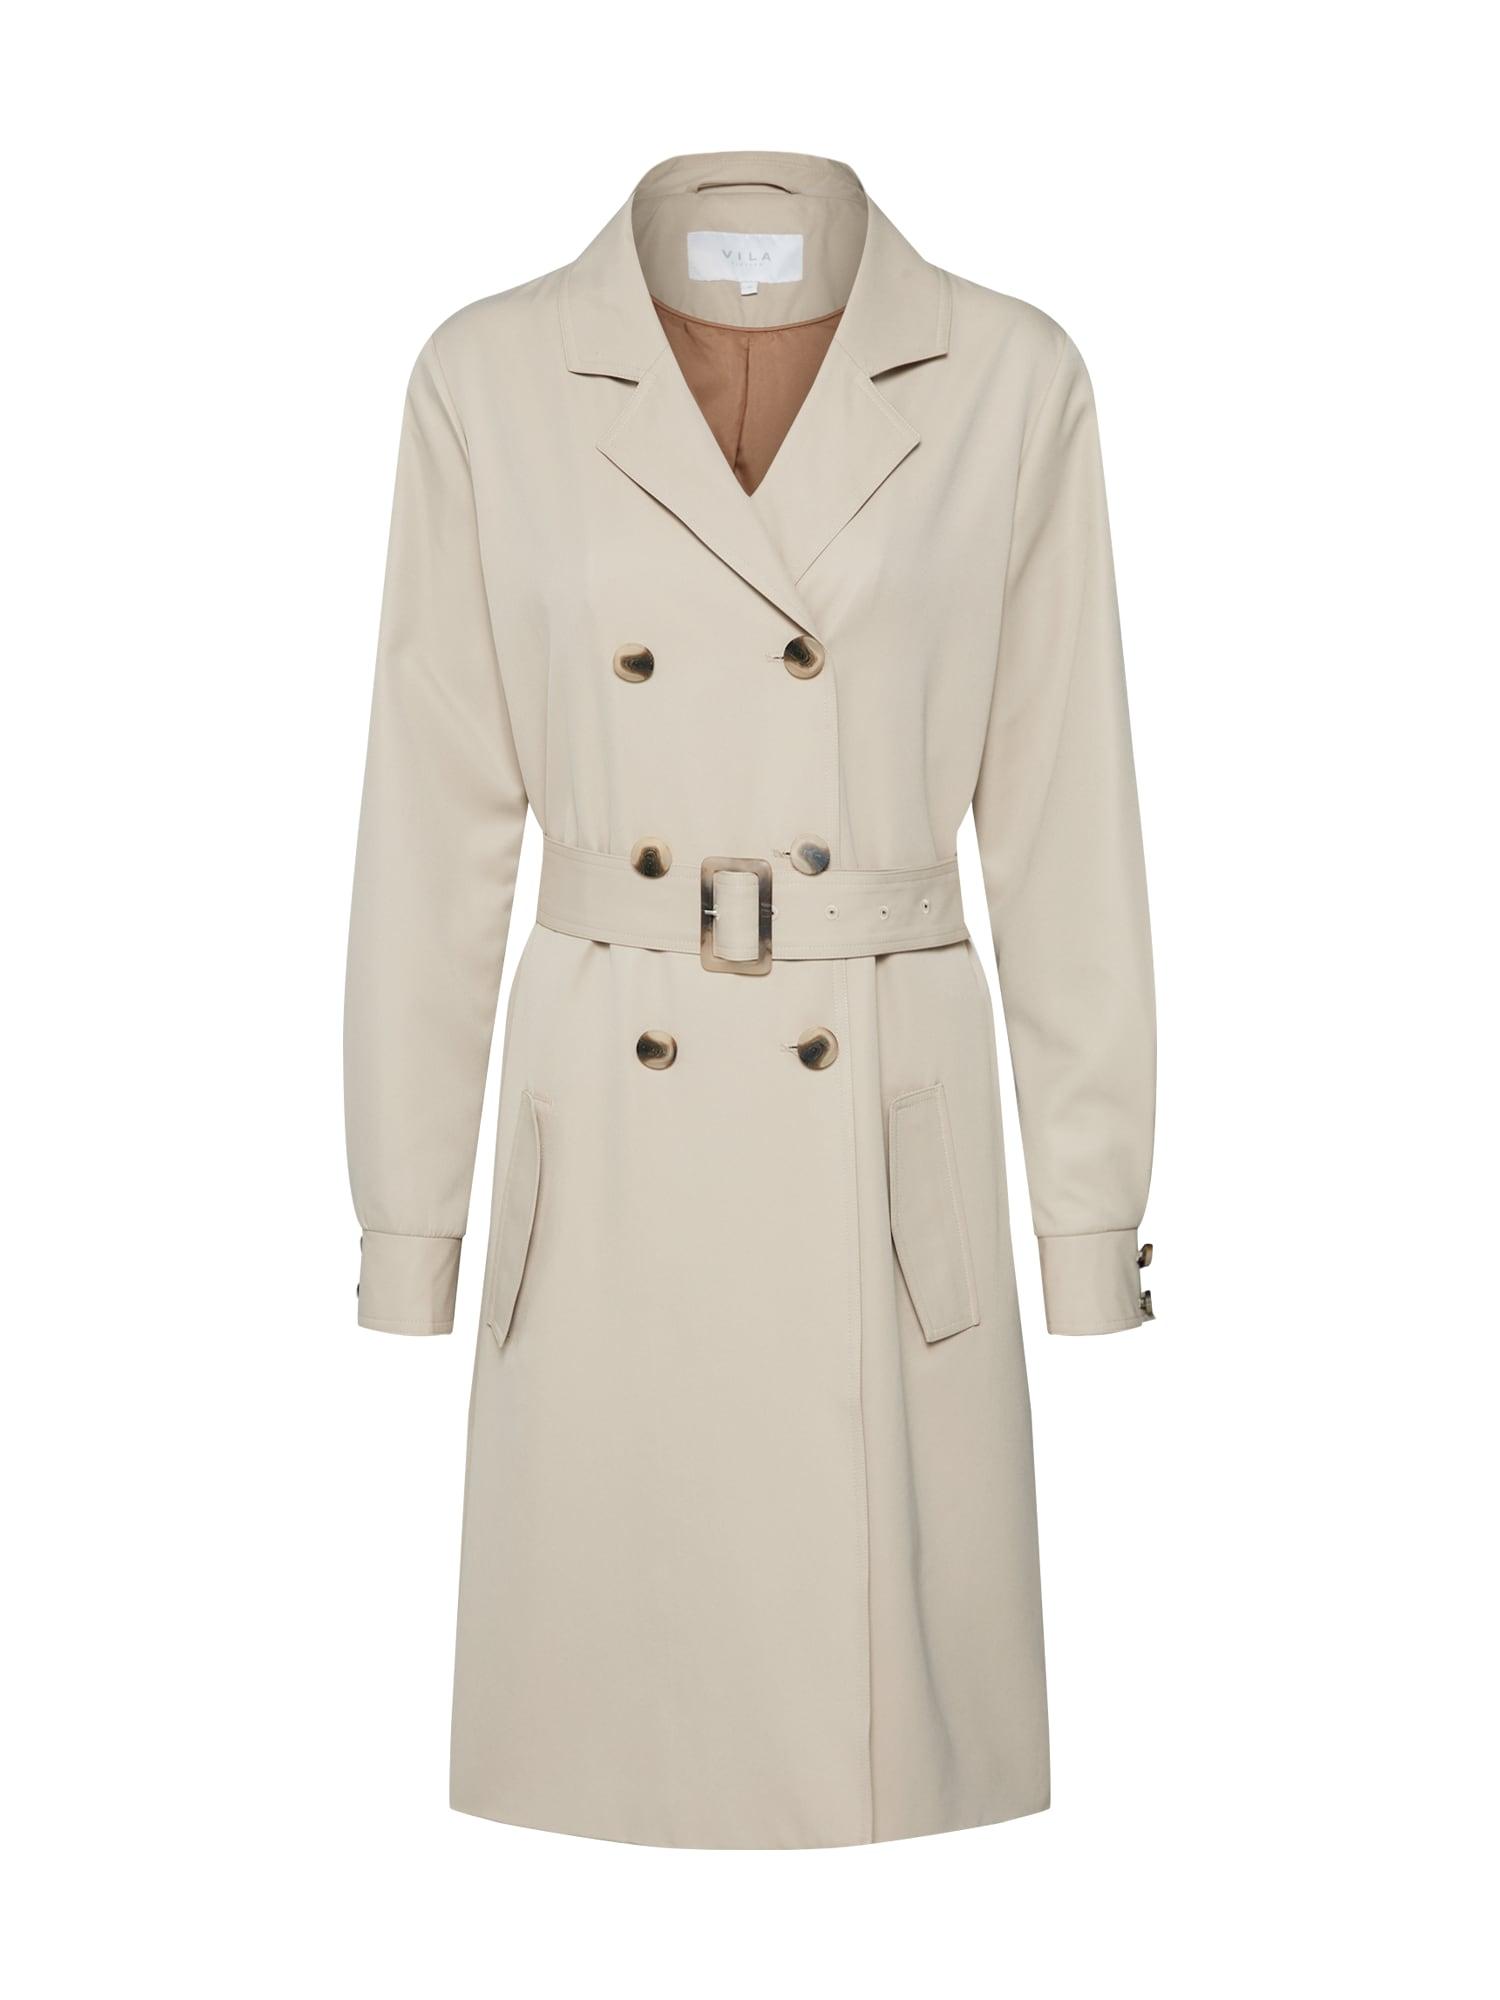 free shipping dc932 ab658 Damen Trenchcoats online günstig kaufen über shop24.at | shop24